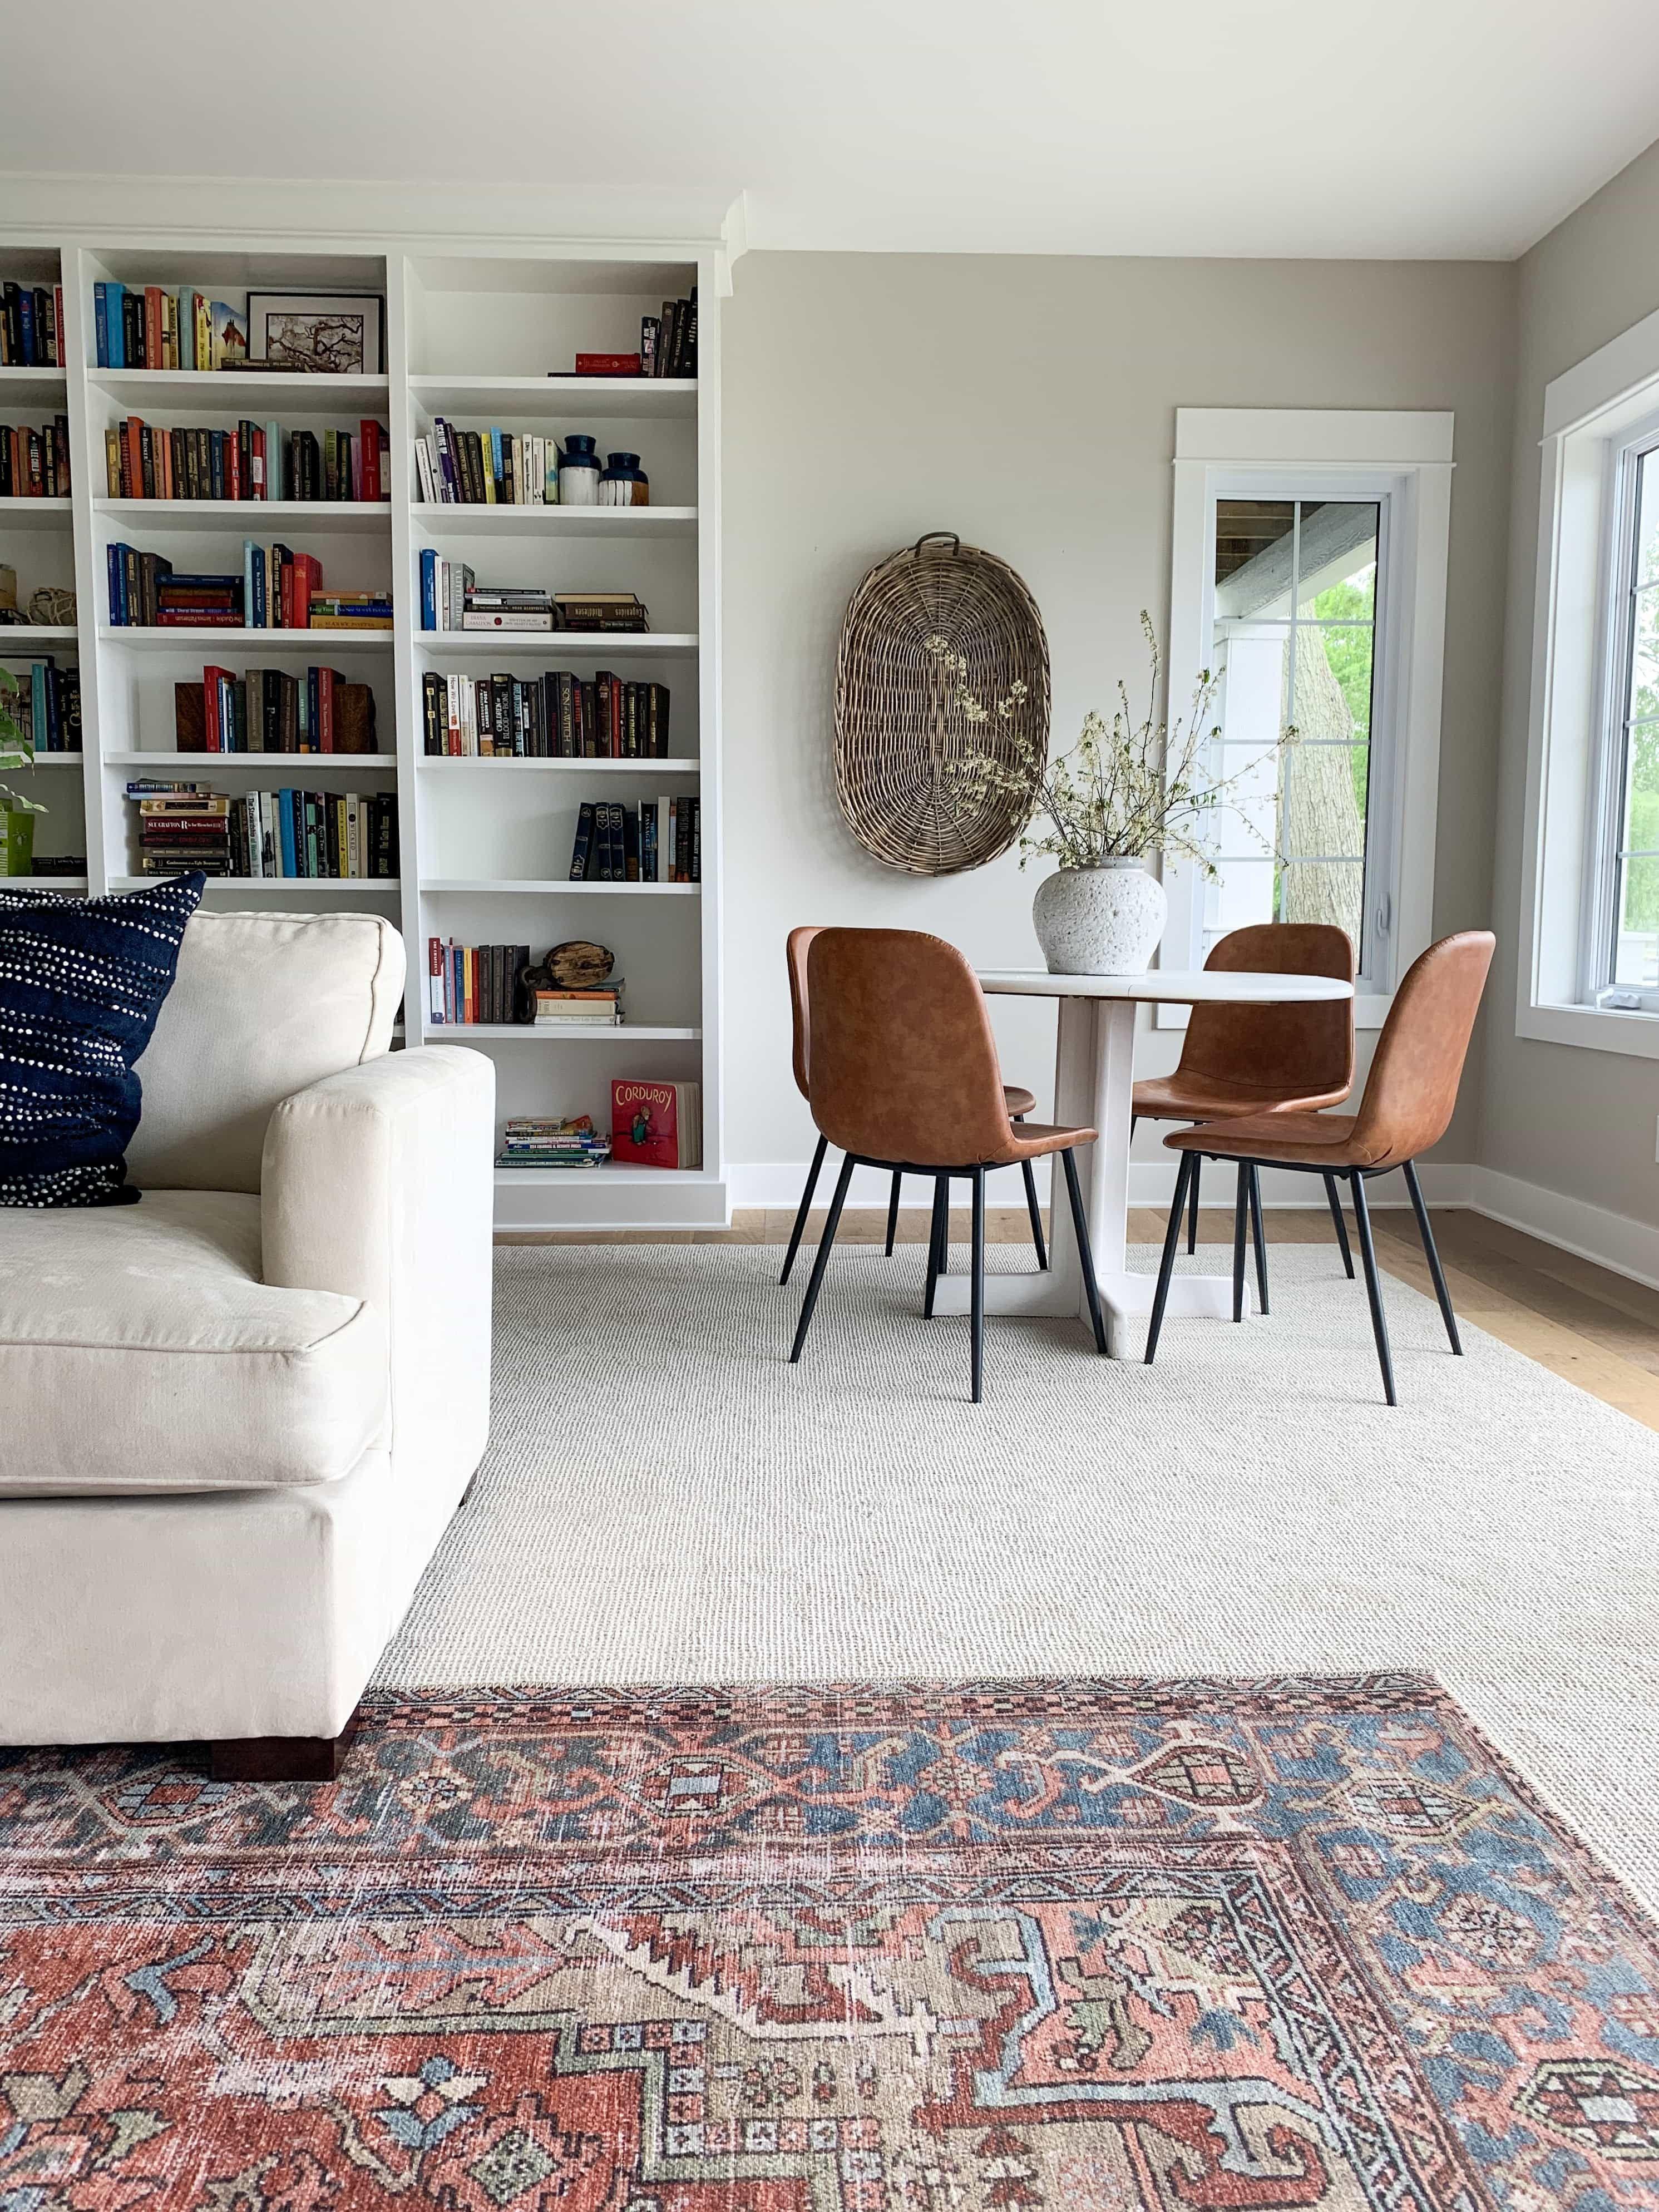 A Little Life Update The Lilypad Cottage Beige Carpet Li